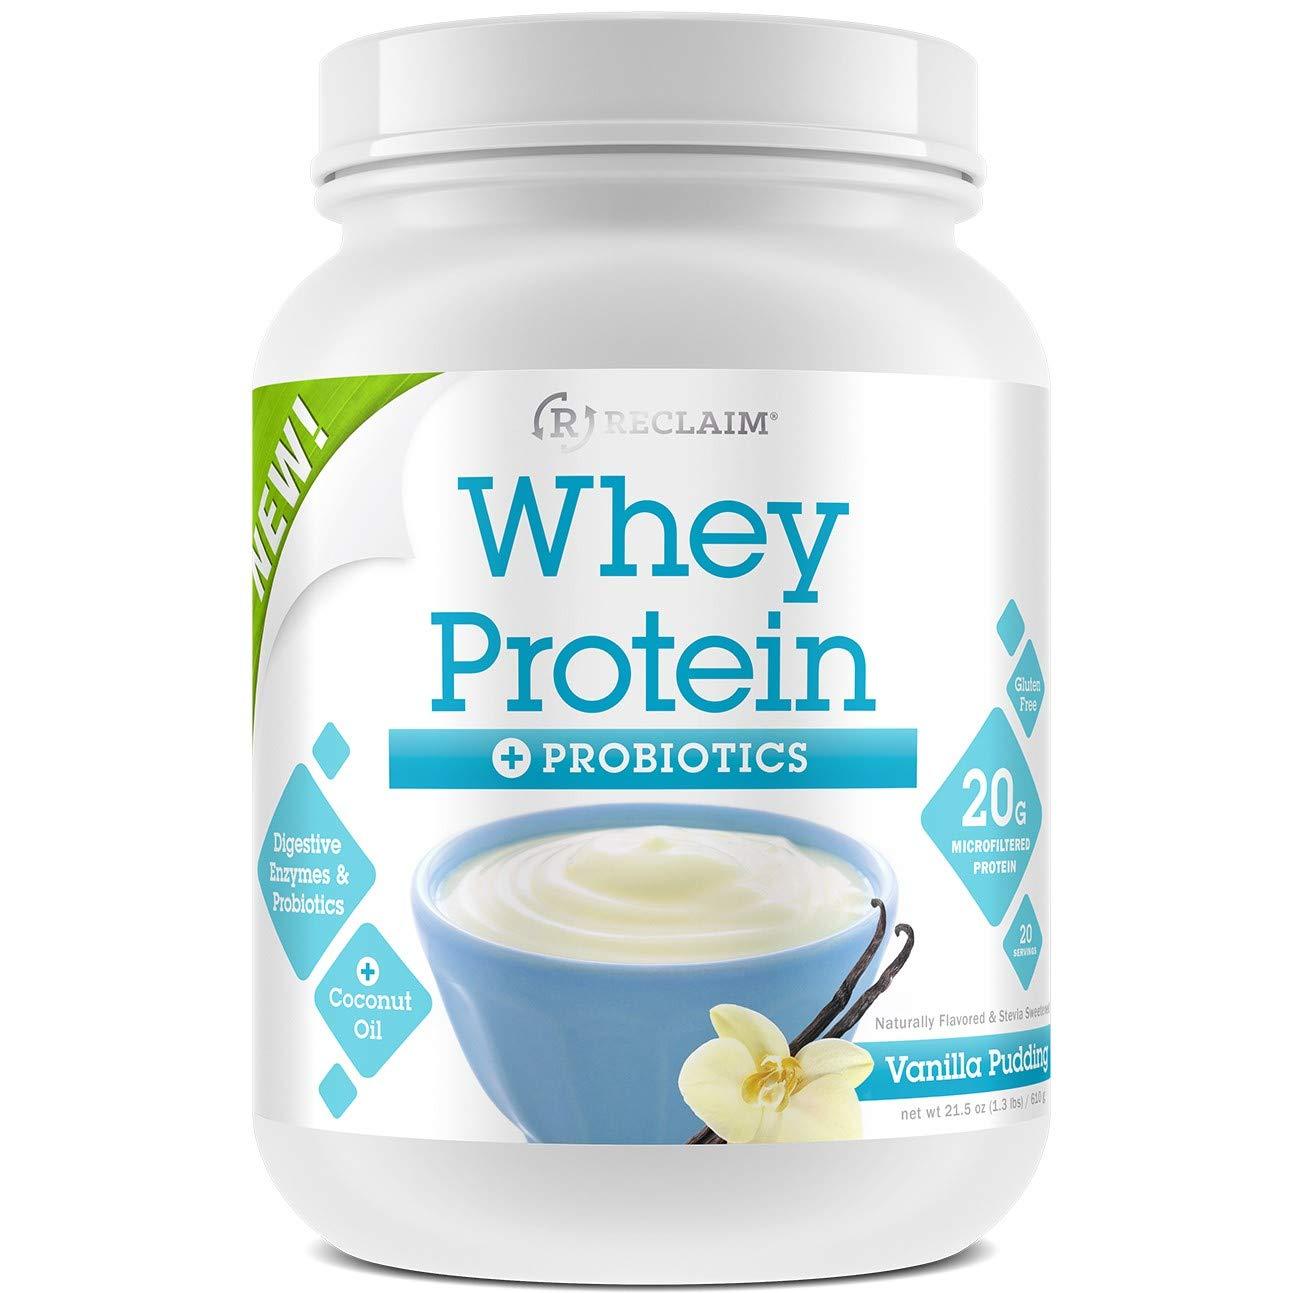 Complete Nutrition Reclaim Whey Protein Powder Probiotics, Vanilla Pudding, 20g Protein, Gluten Free, Stevia Sweetened, 21.8oz Tub